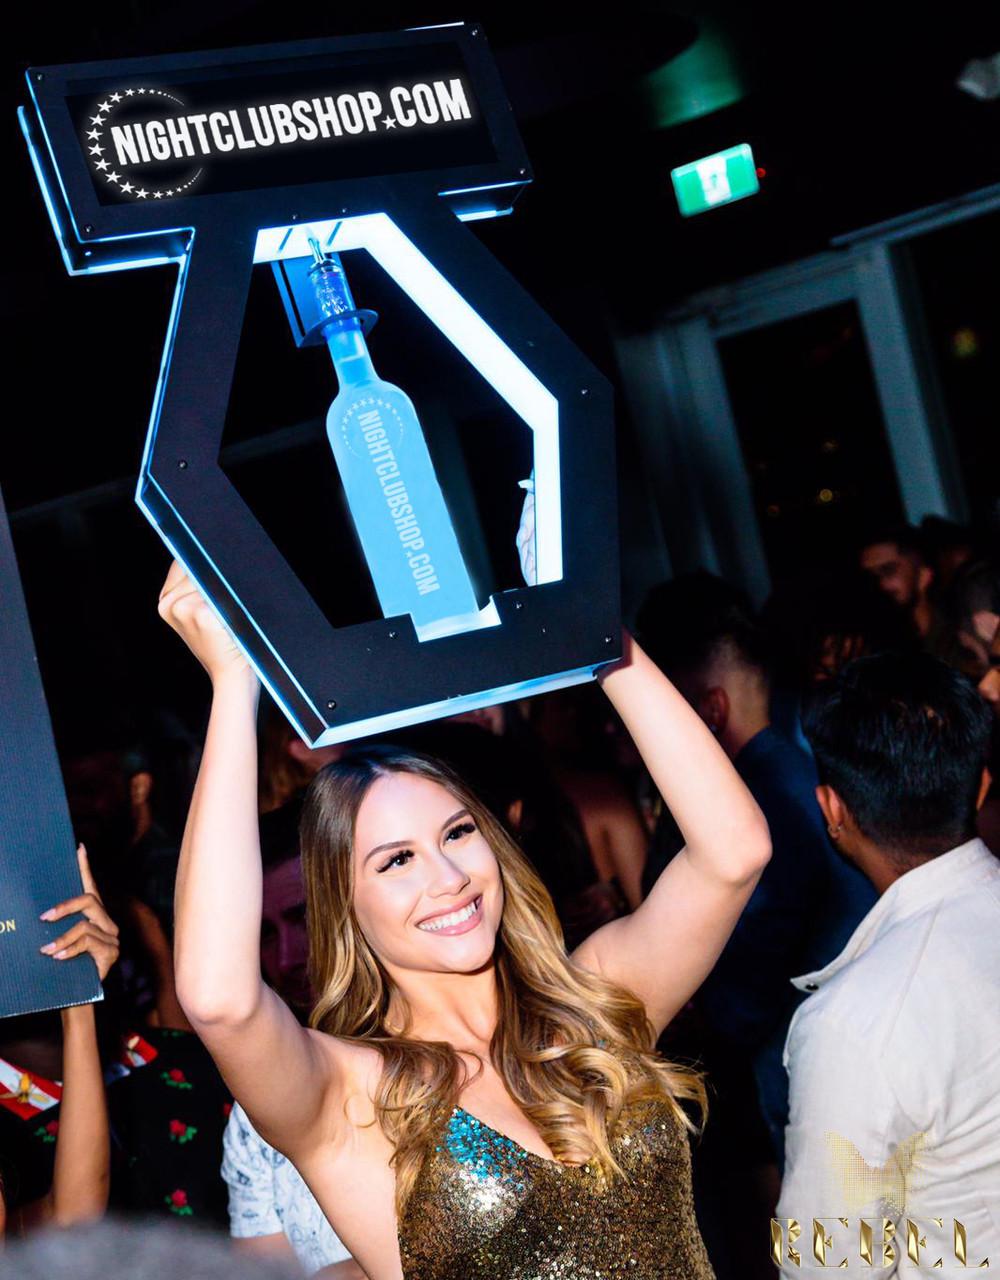 VIP, LED, Champagne, Liquor, bottle, service, POS, Presenter, presentation, tray, caddie